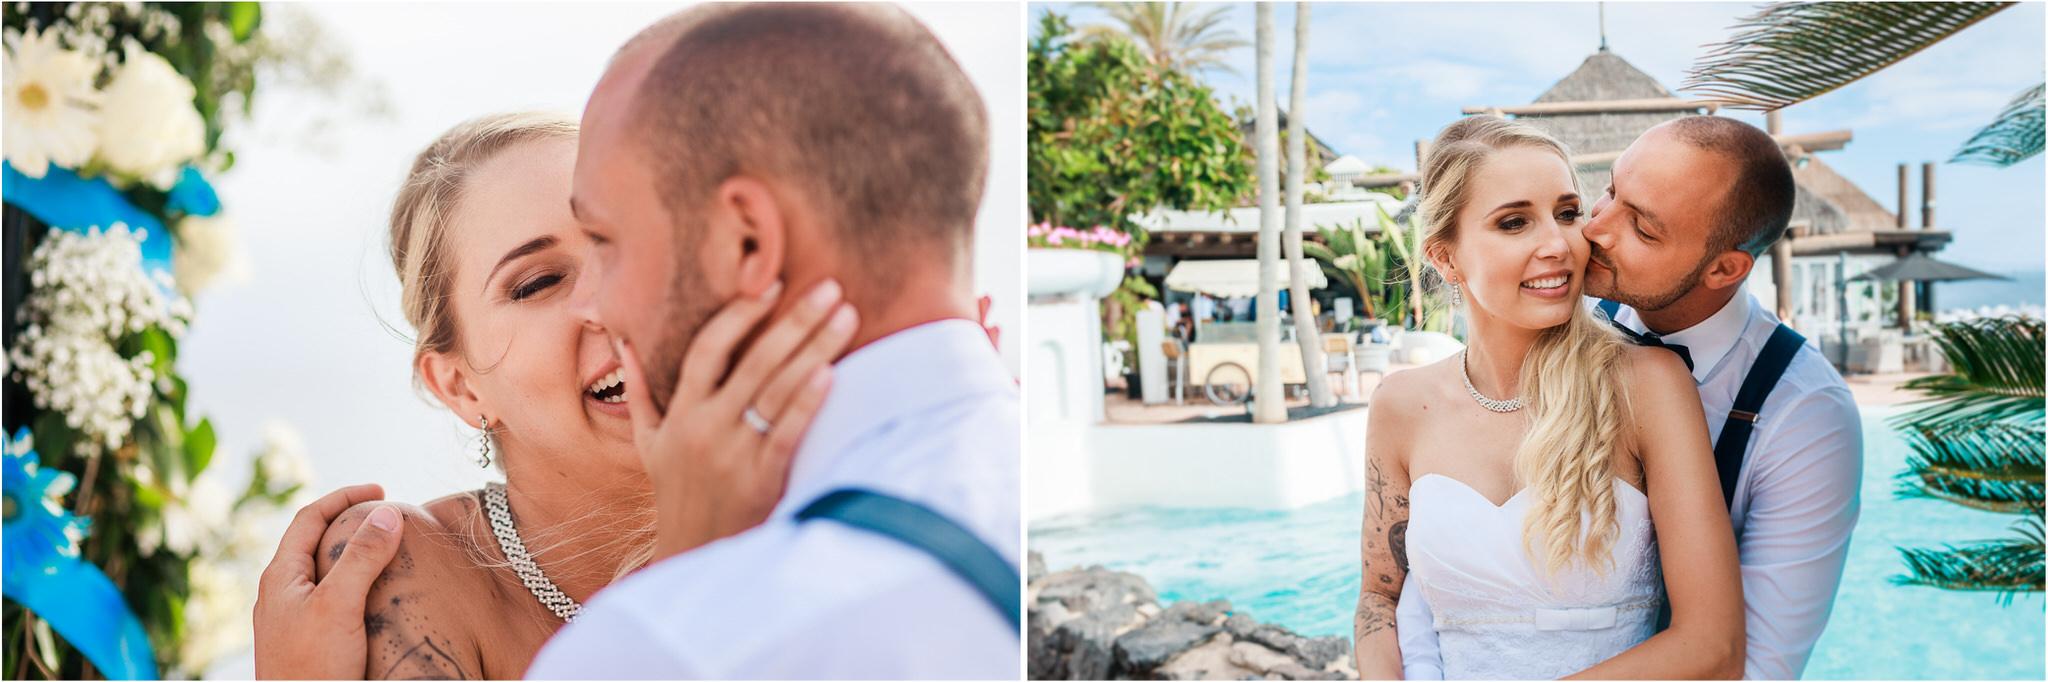 Hochzeitsfoto-Teneriffa-35.jpg